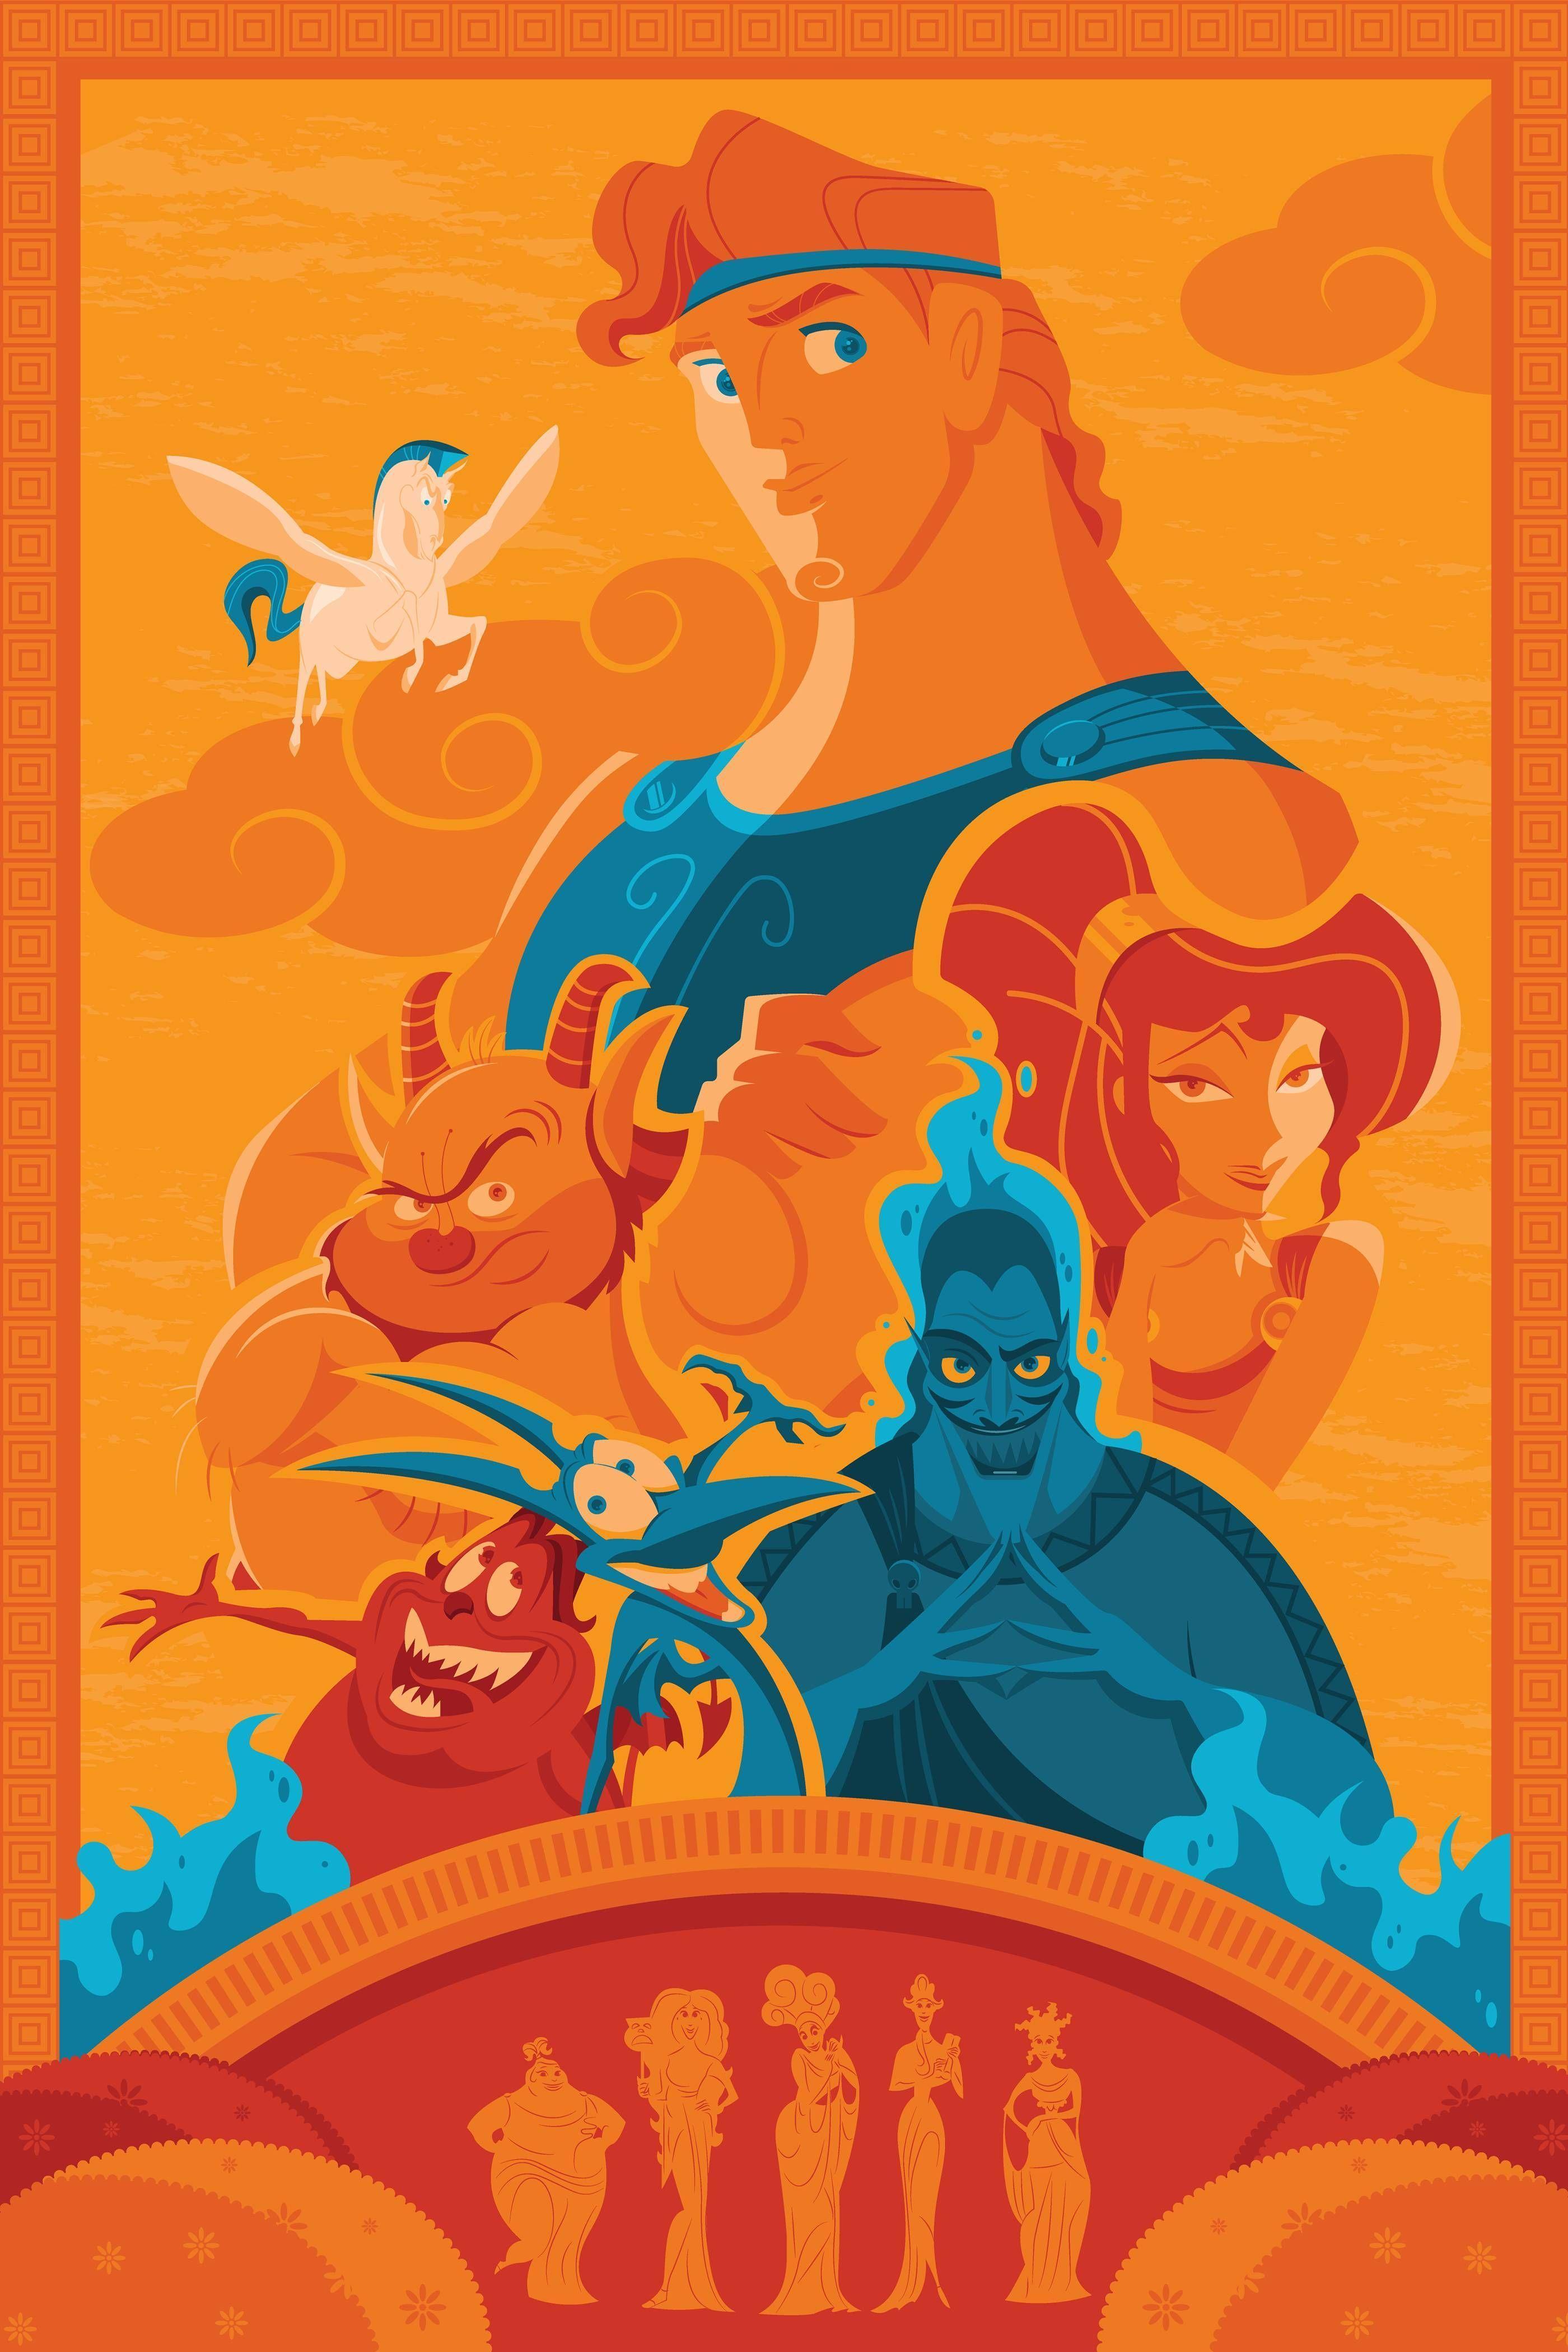 Hercules Disney Wallpapers Top Free Hercules Disney Backgrounds Wallpaperaccess